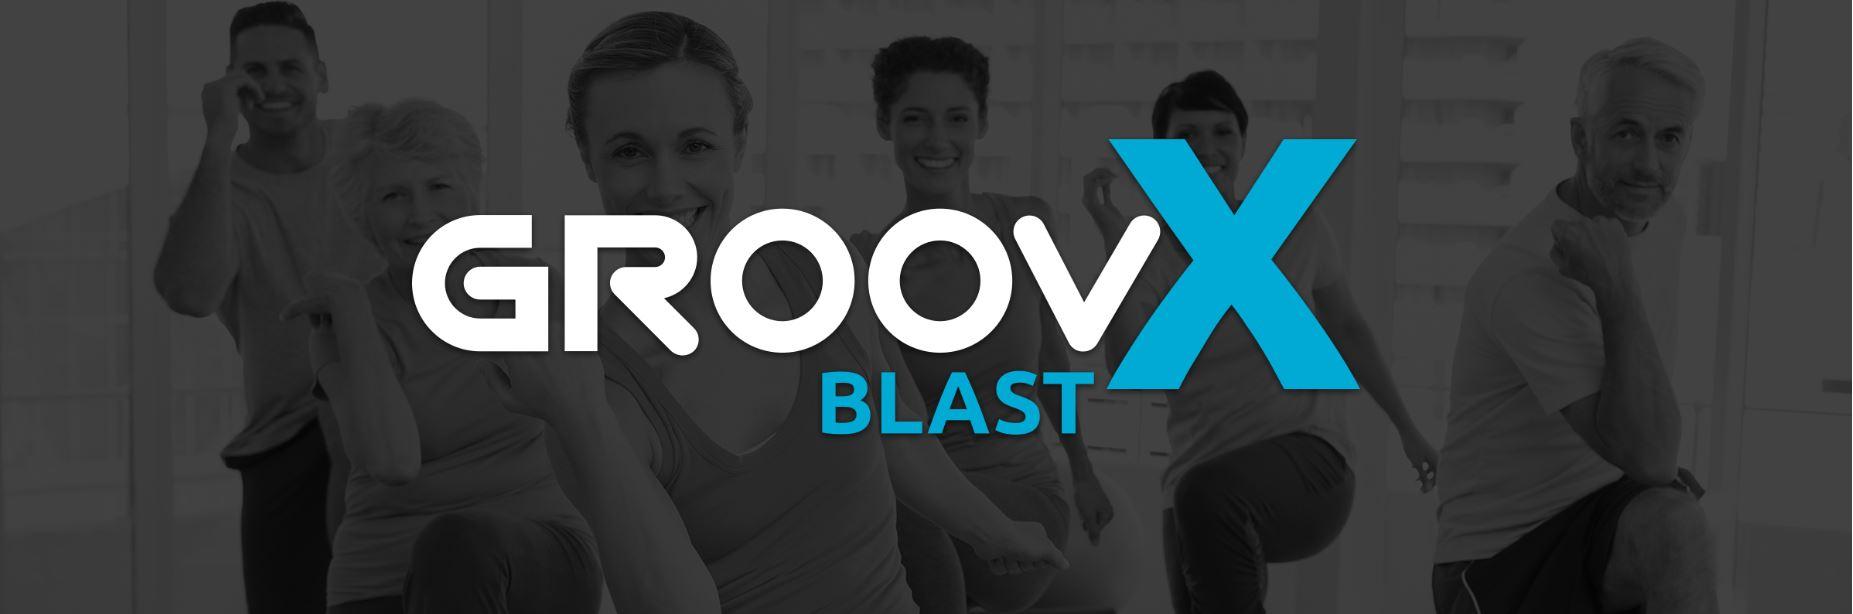 groovX blast logo